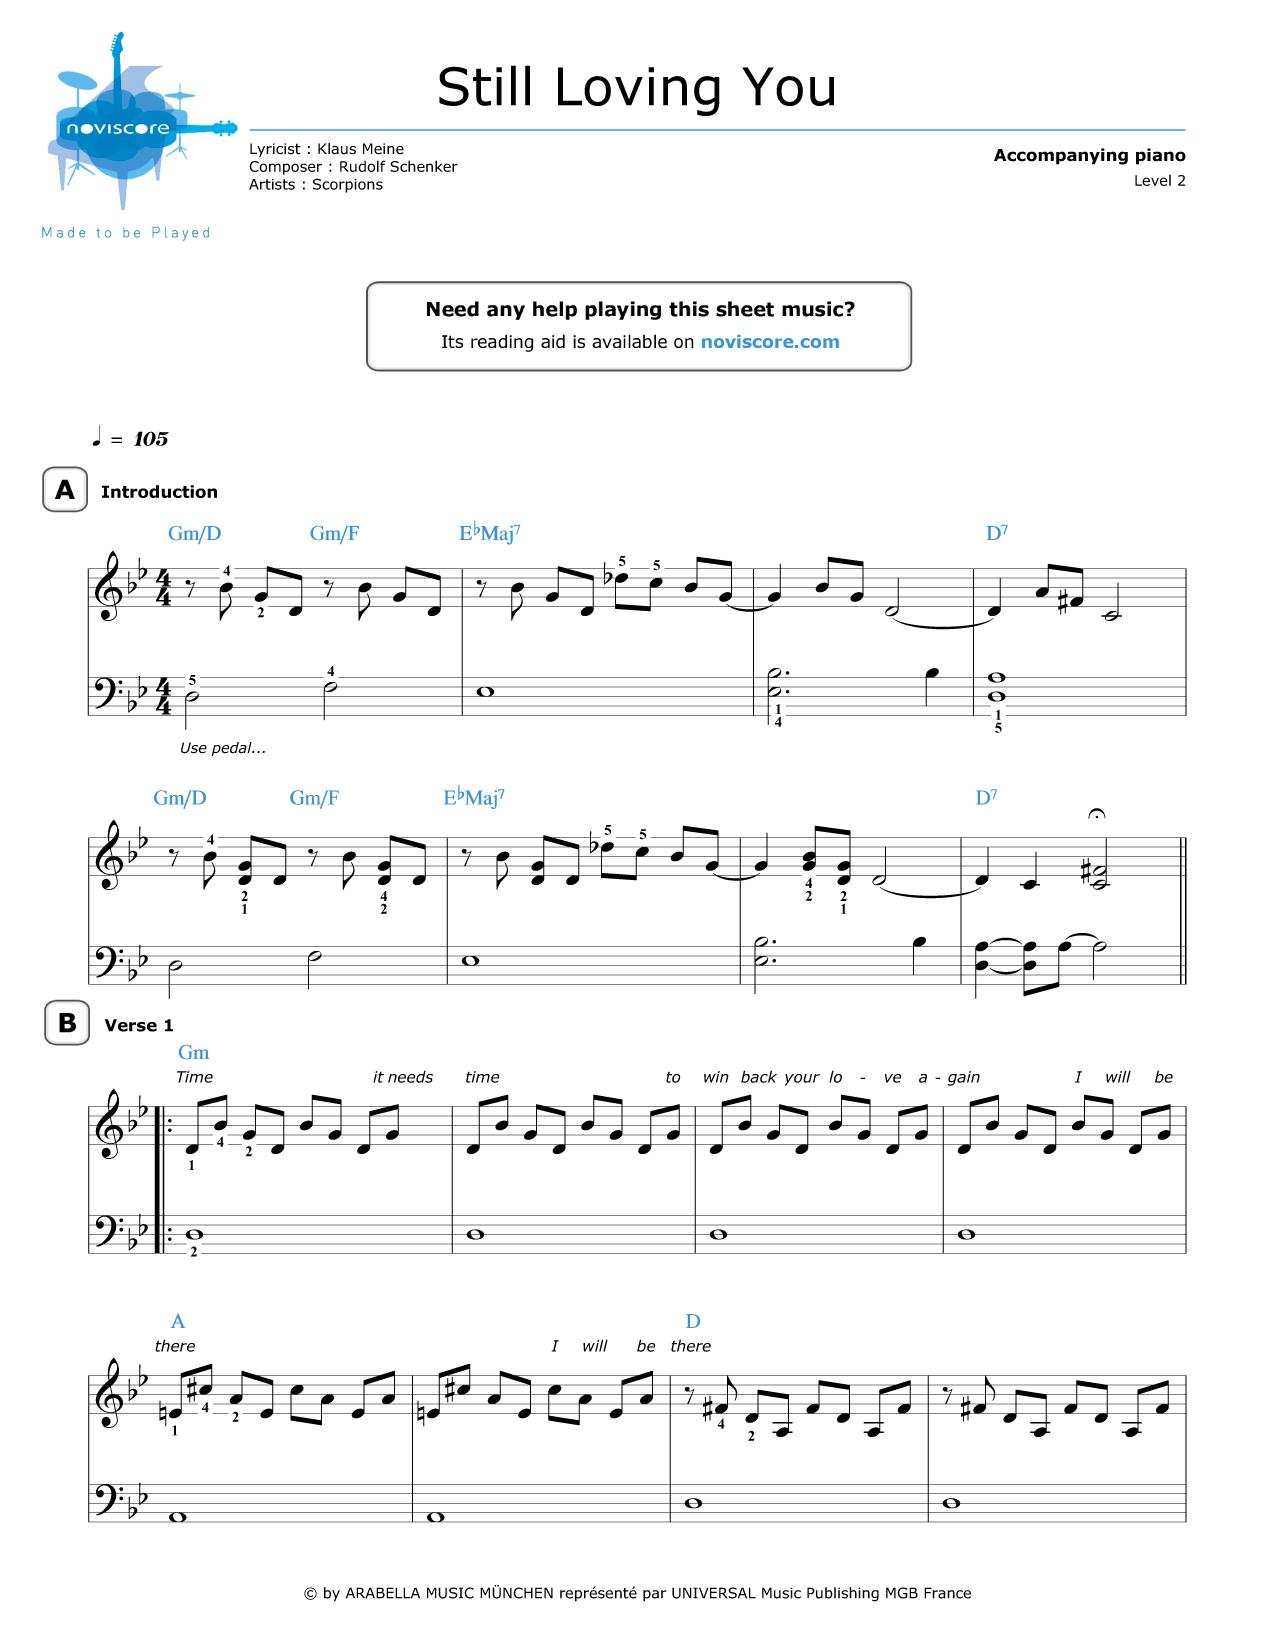 Piano piano note sheet : Piano sheet music Still Loving You (Scorpions) | Noviscore sheets